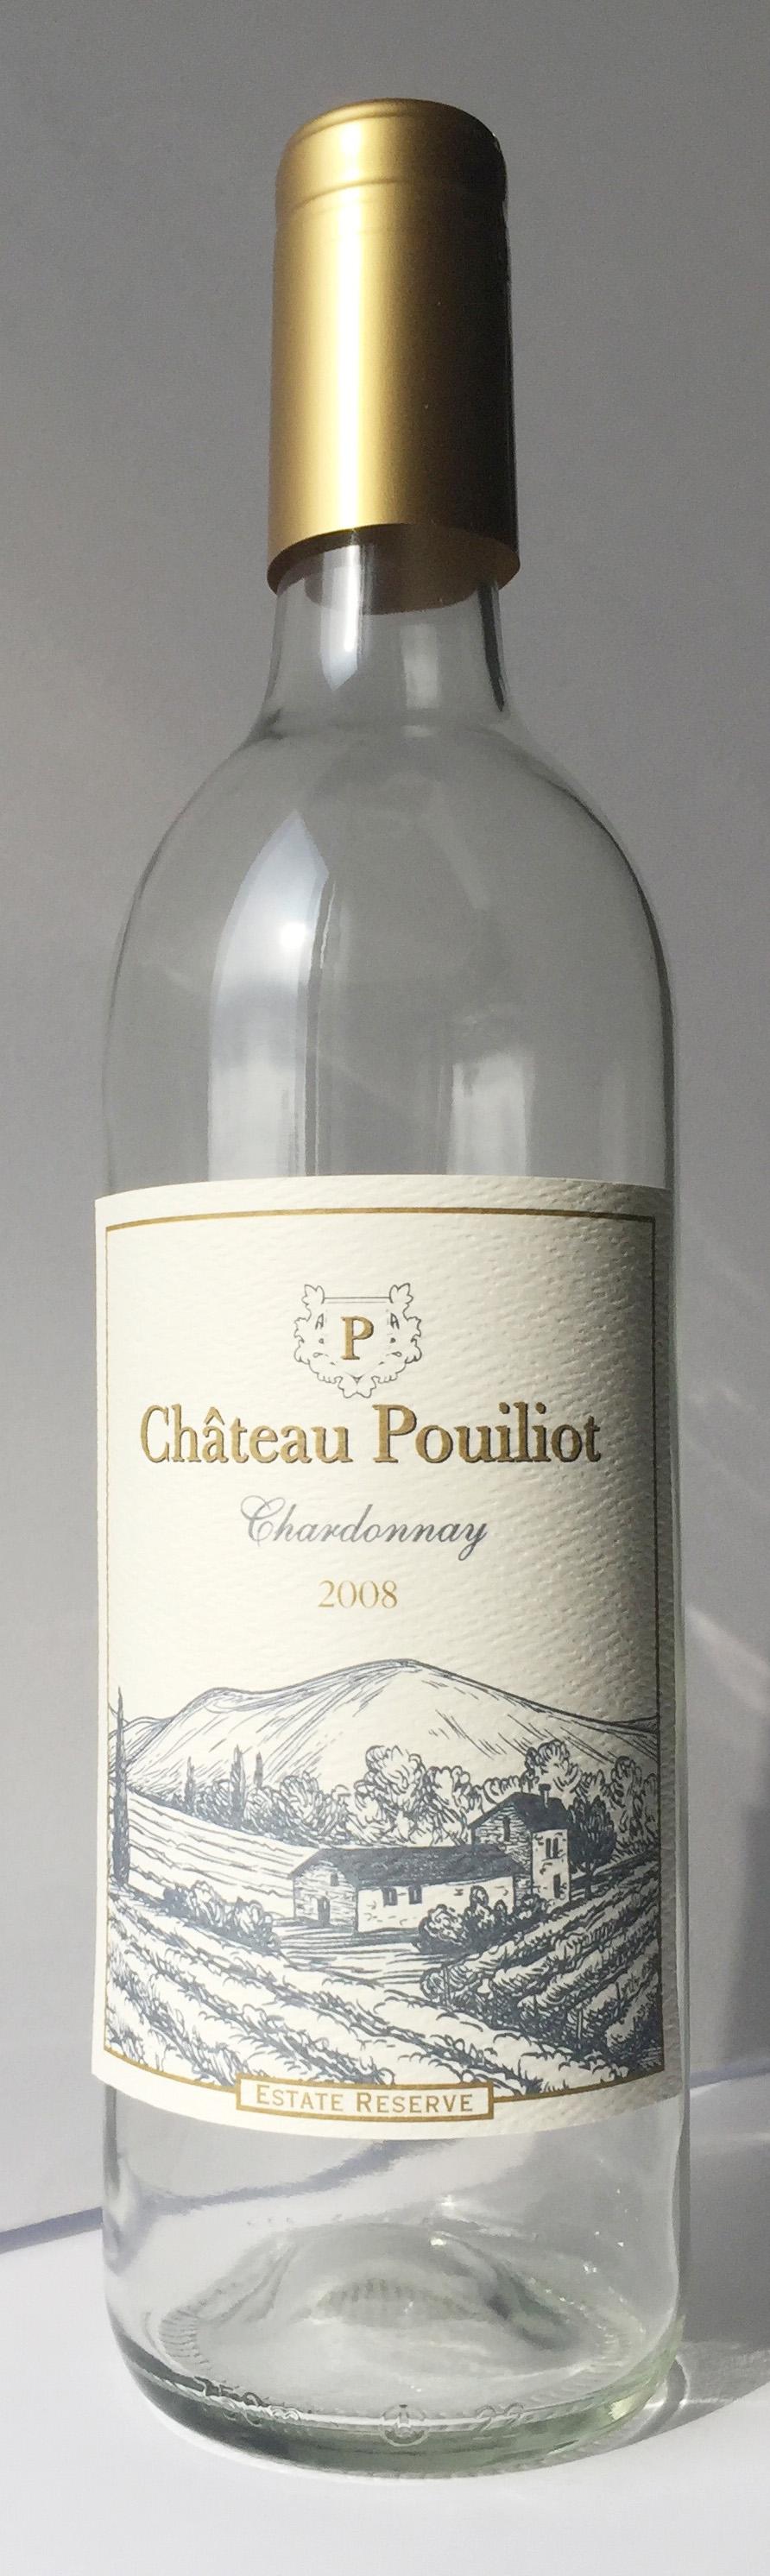 wine 2 front.jpg